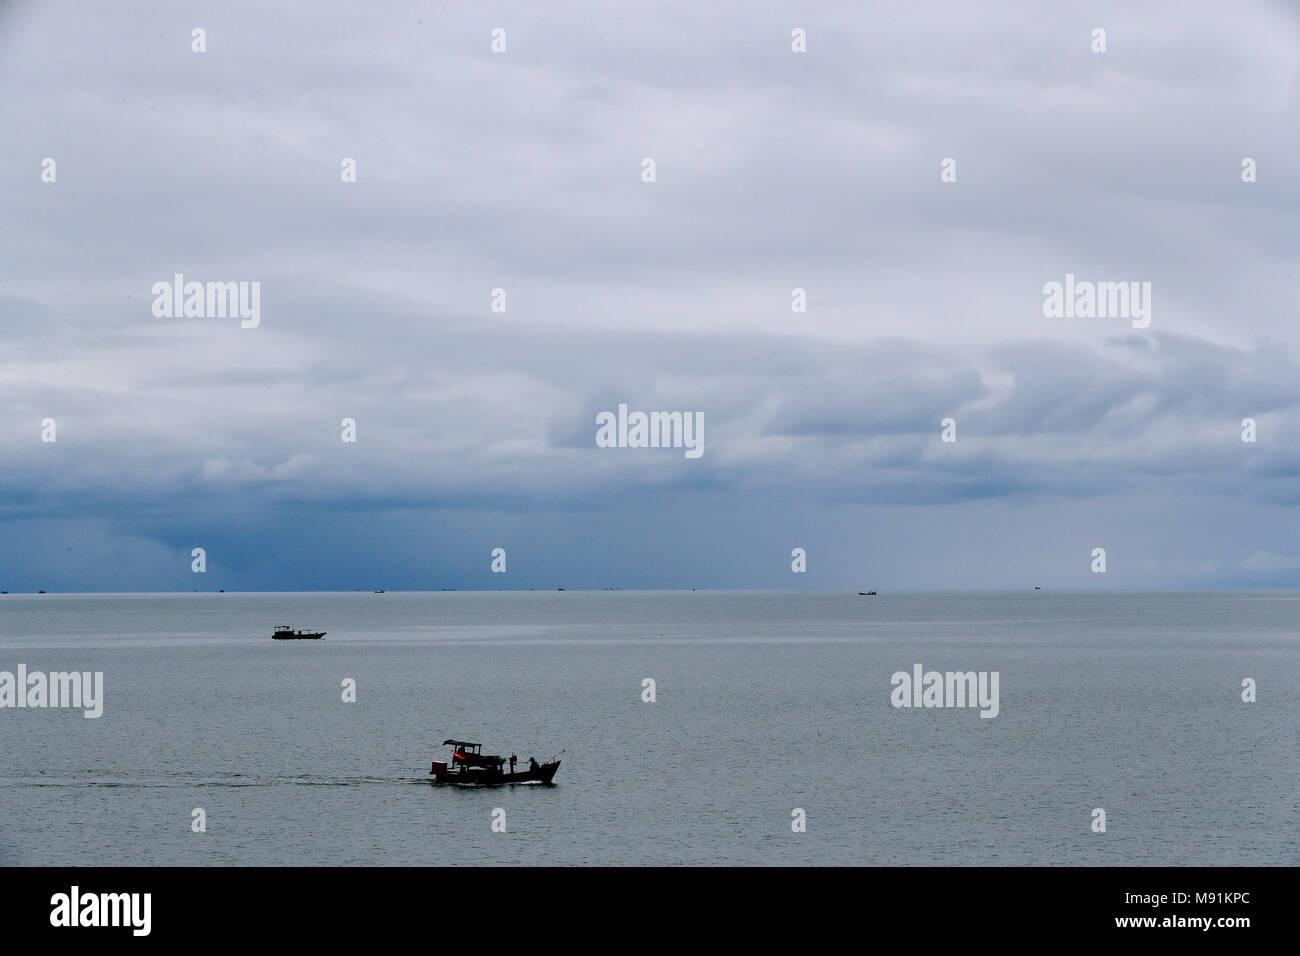 Monsoon season. Fisher boat on the south China Sea.  Phu Quoc. Vietnam. - Stock Image